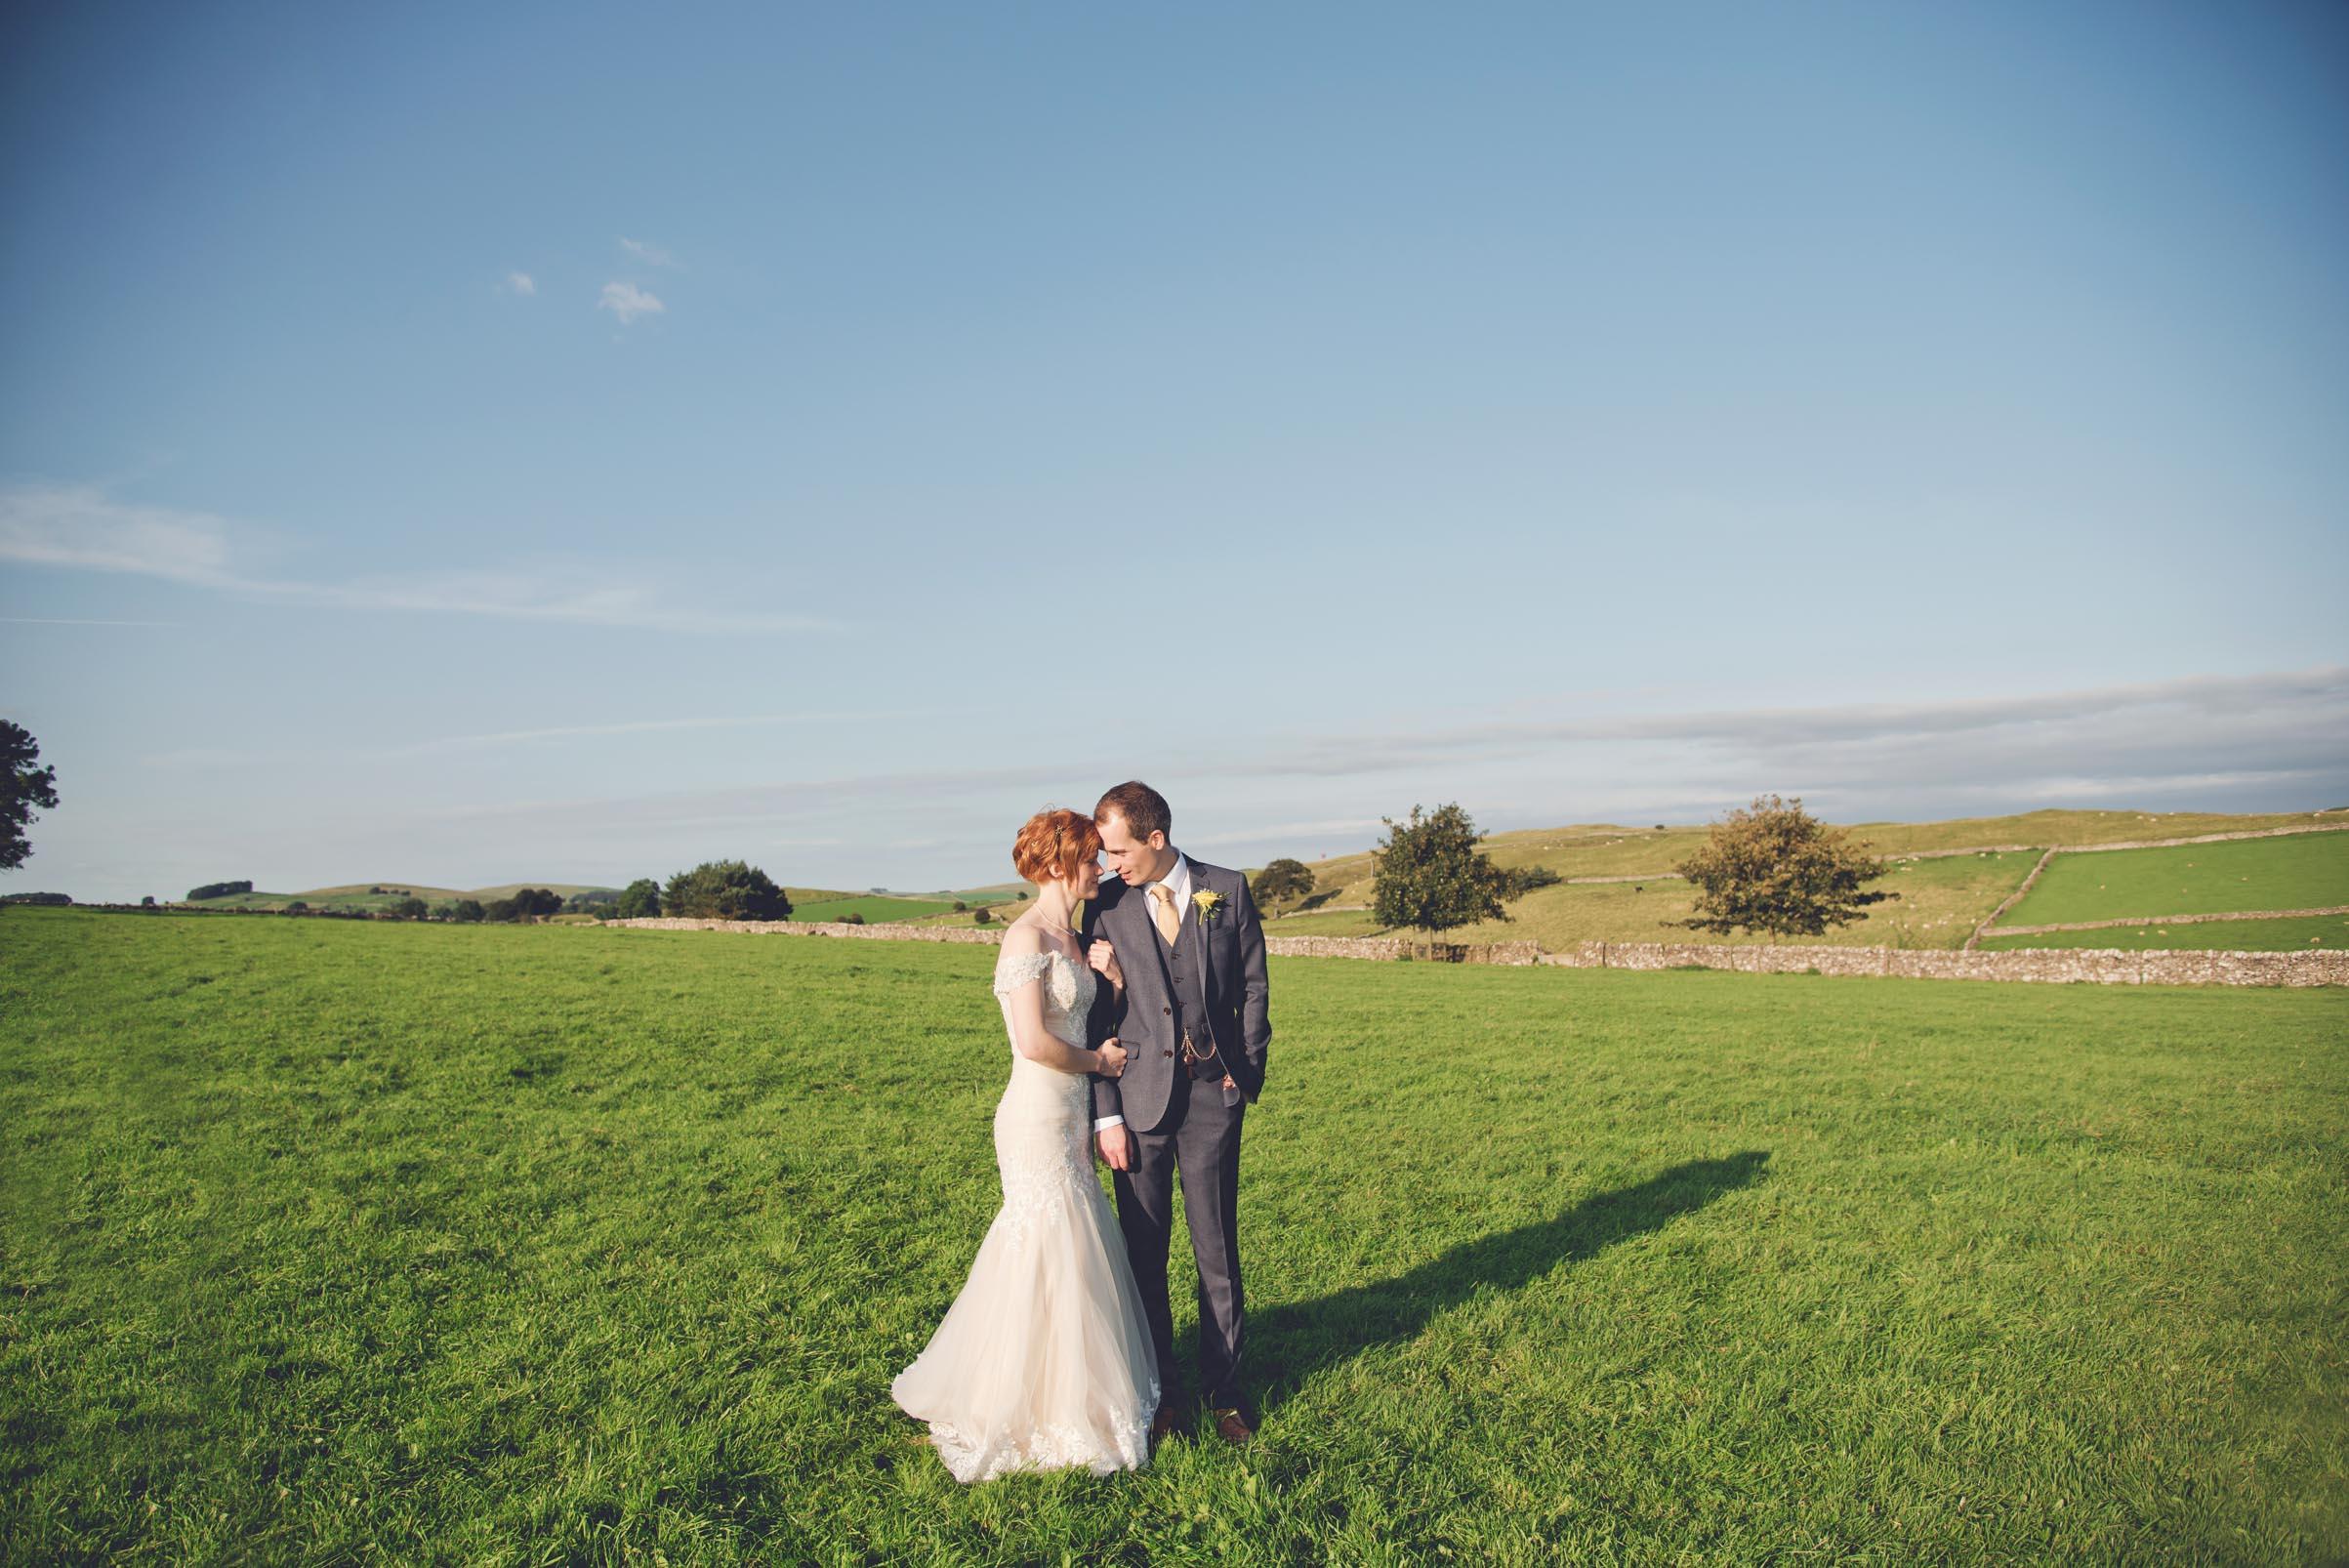 Peak+district+farm+wedding+lower+damgate+photographer-194.jpg